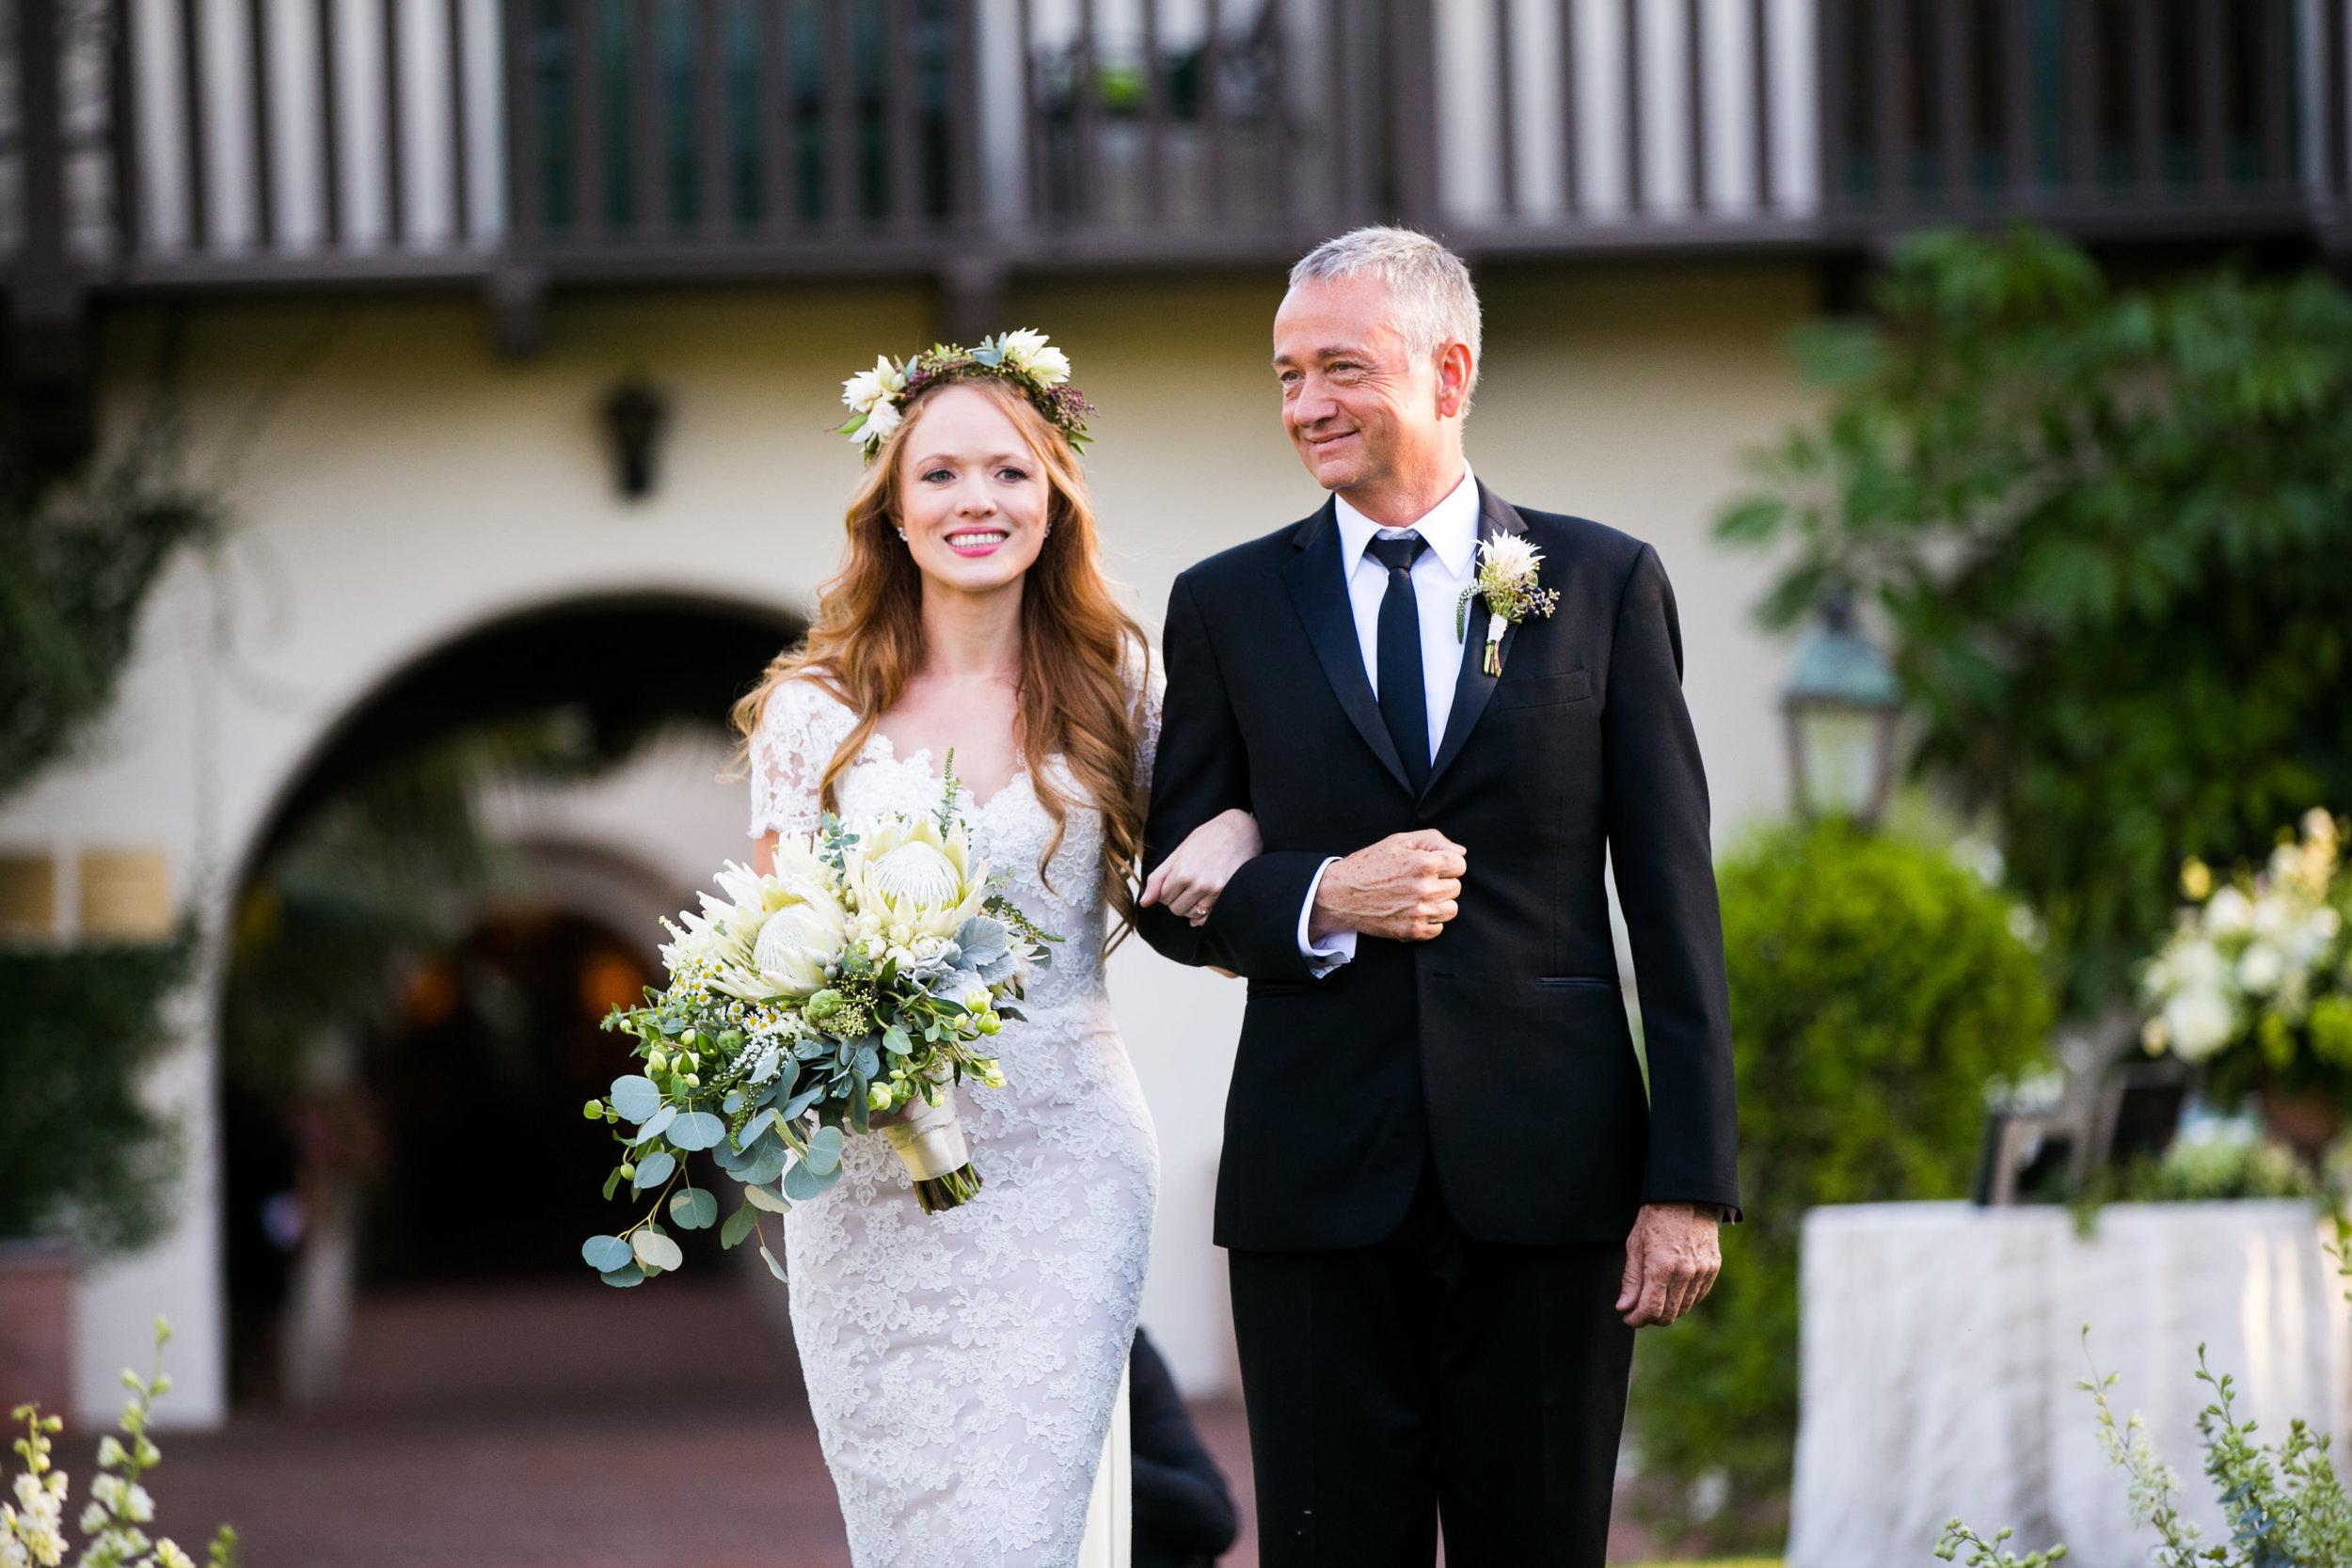 www.santabarbarawedding.com   Four Seasons Santa Barbara   Levine Fox Events   Callaway Gable Photo   Bride and Father Walking Down Aisle